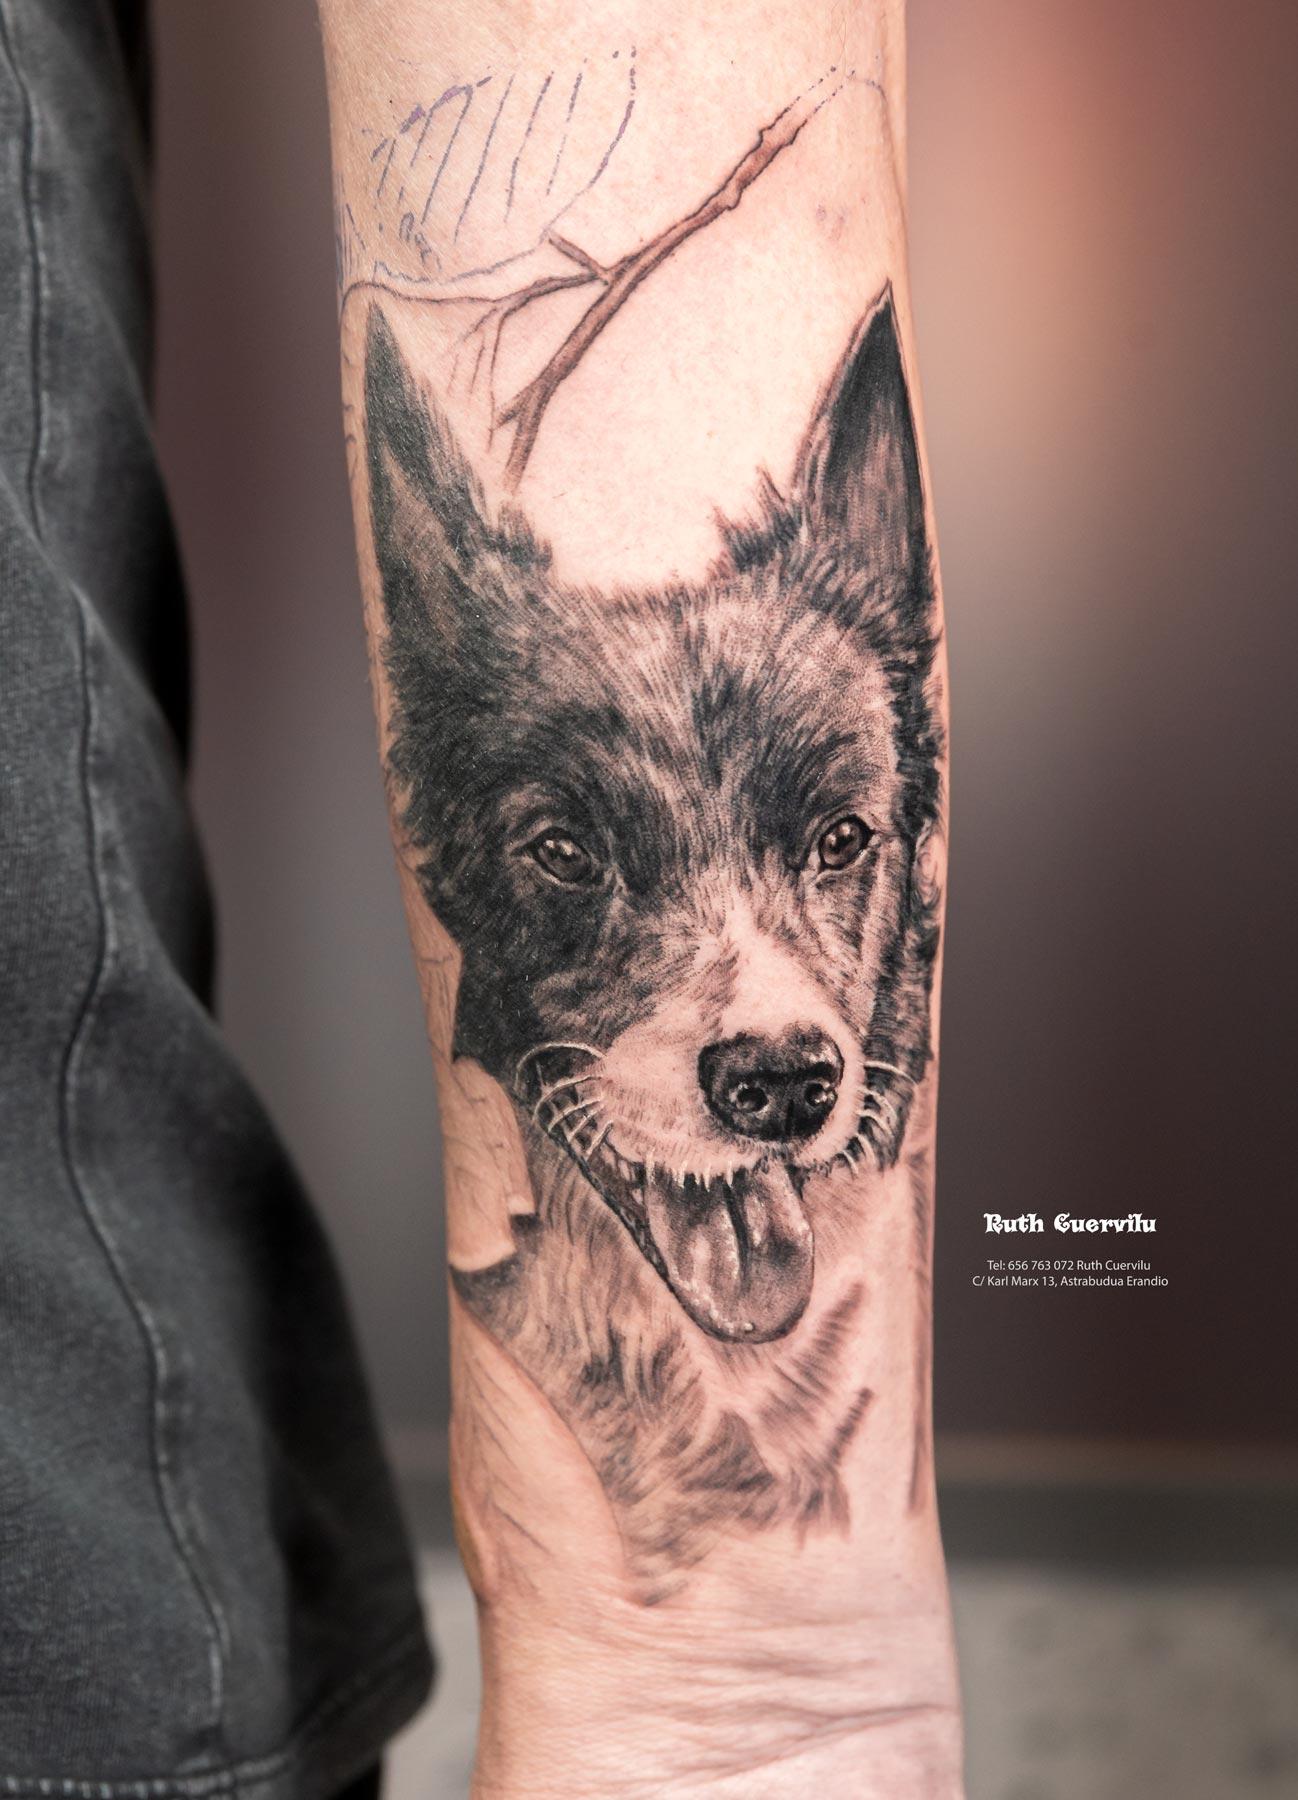 Tatuaje Retrato Perros 2 sesion manga - Ruth Cuervilu Tattoo - KM13 Studio - Estudio de tatuajes Astrabudua Erandio Bizkaia Bilbao Barakaldo Getxo Leioa Gasteiz Cantabria